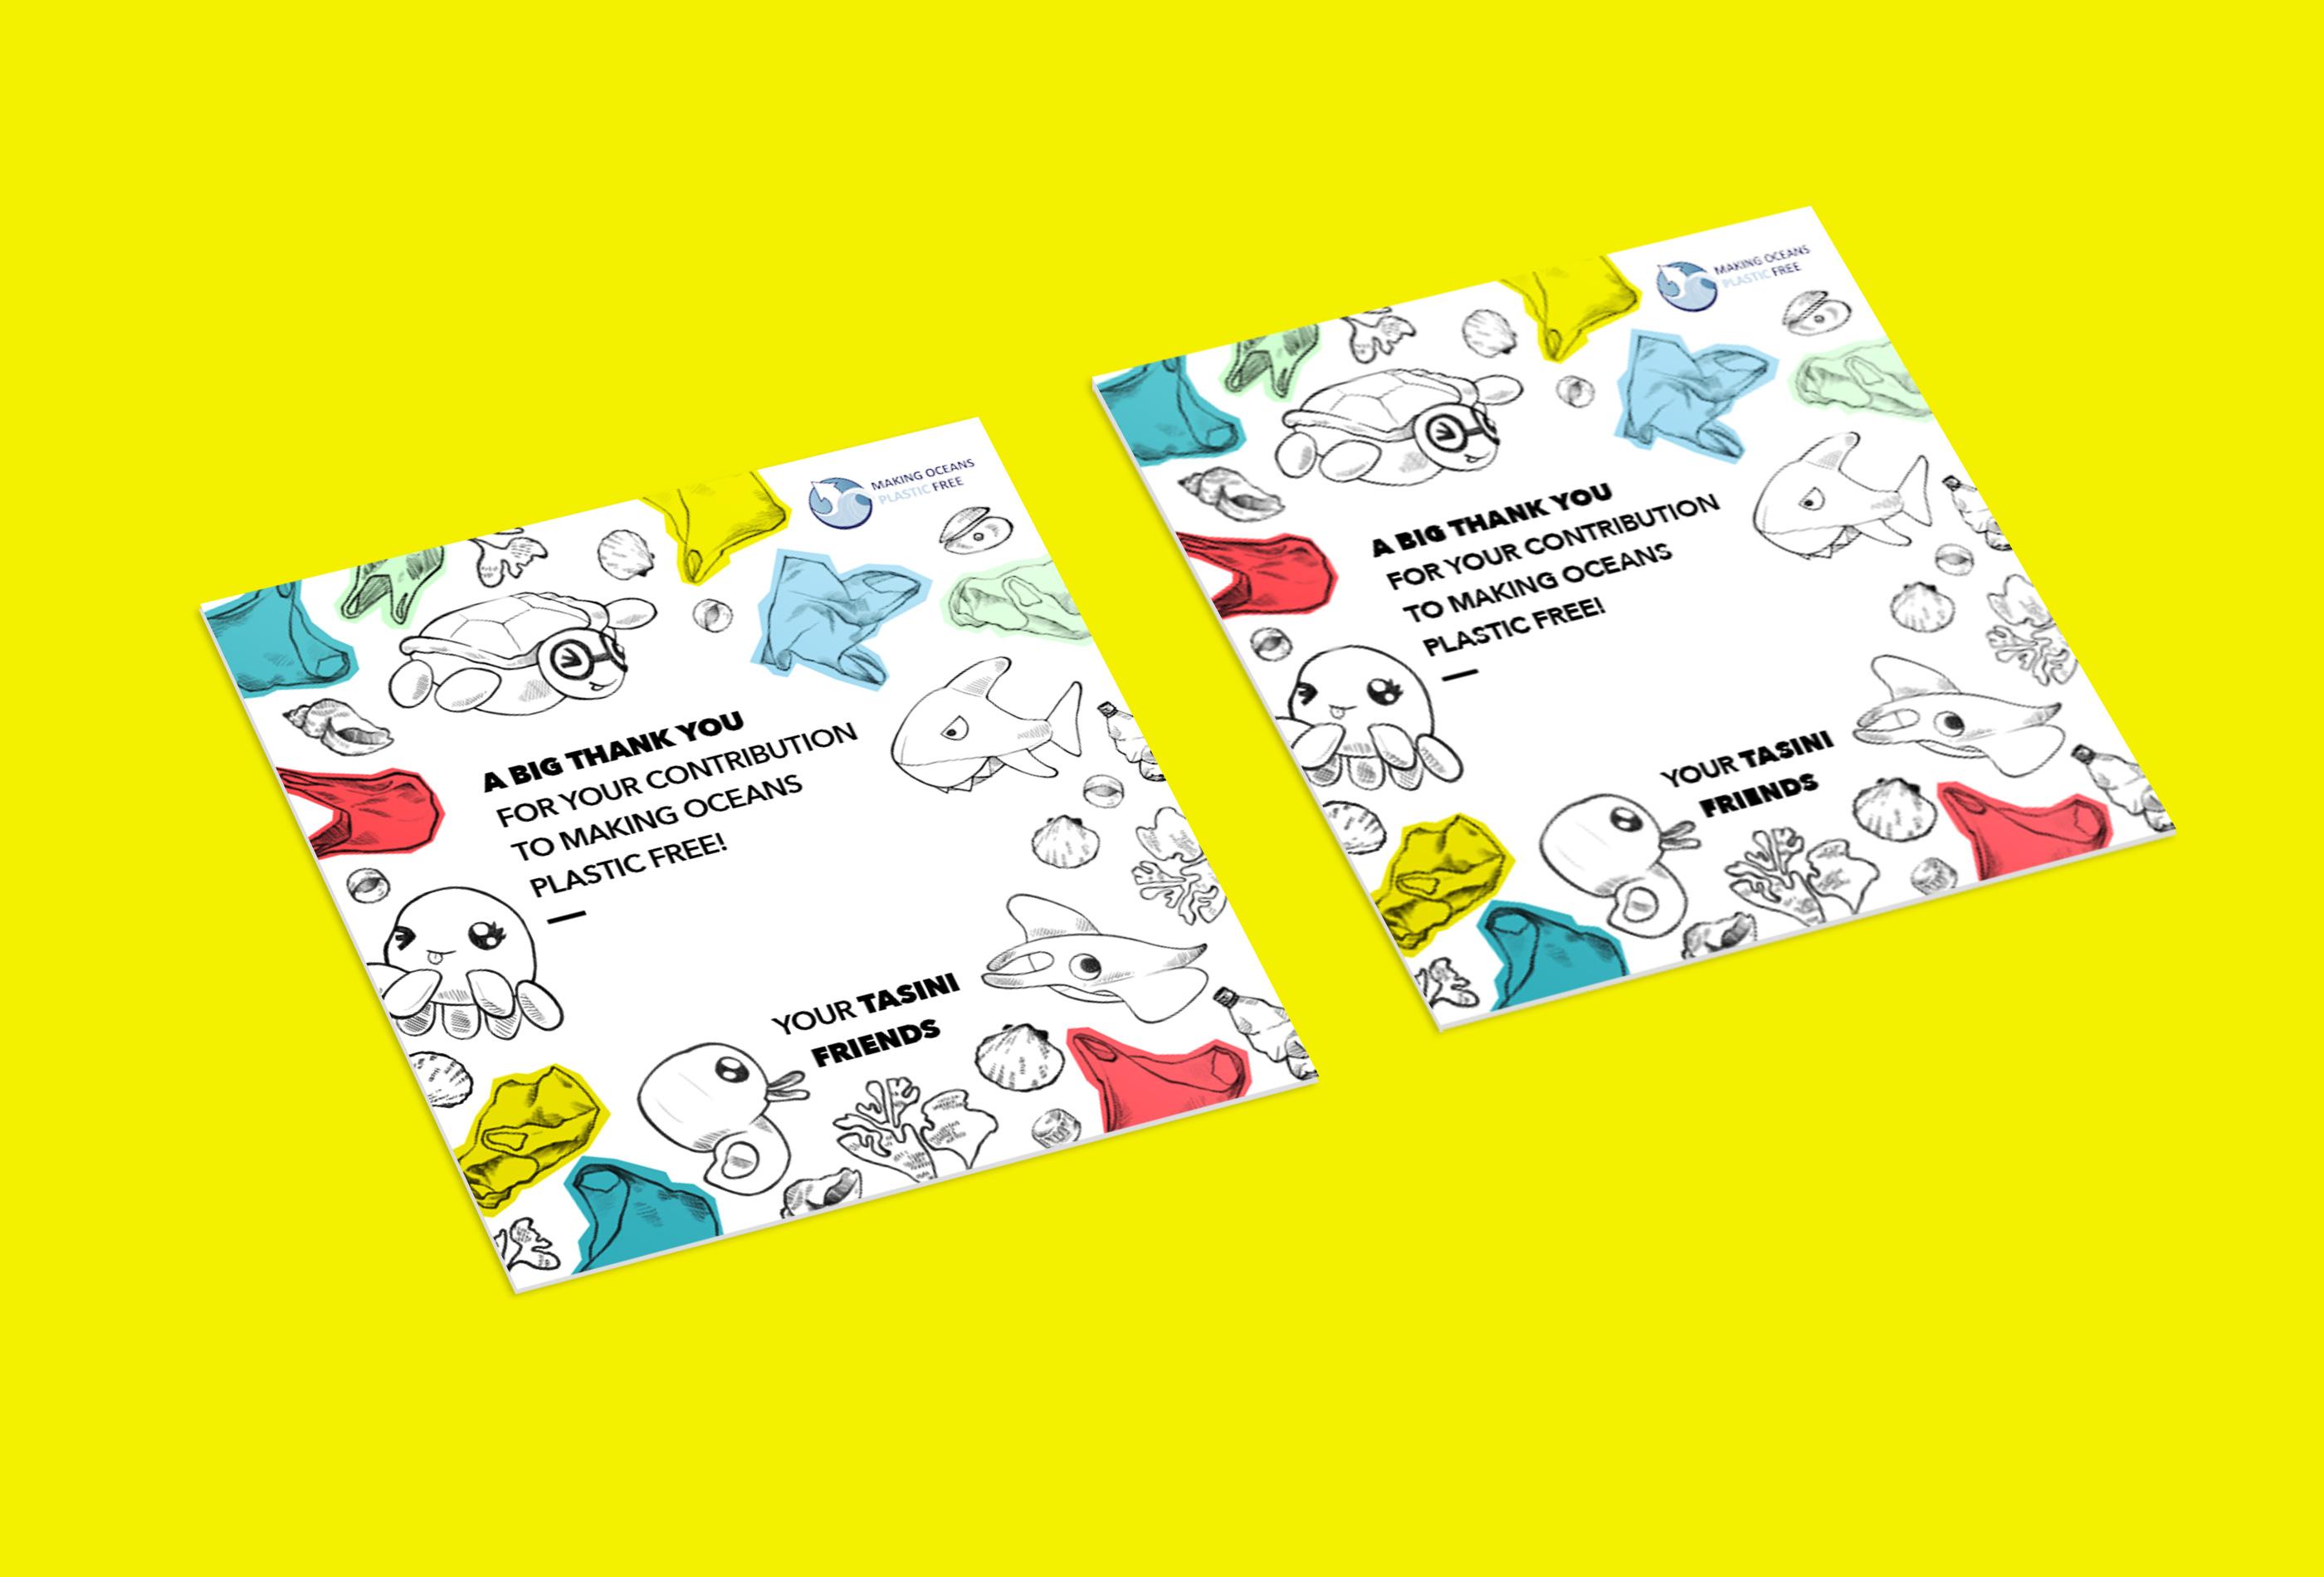 Making Oceans Plastic Free Dankeskarte